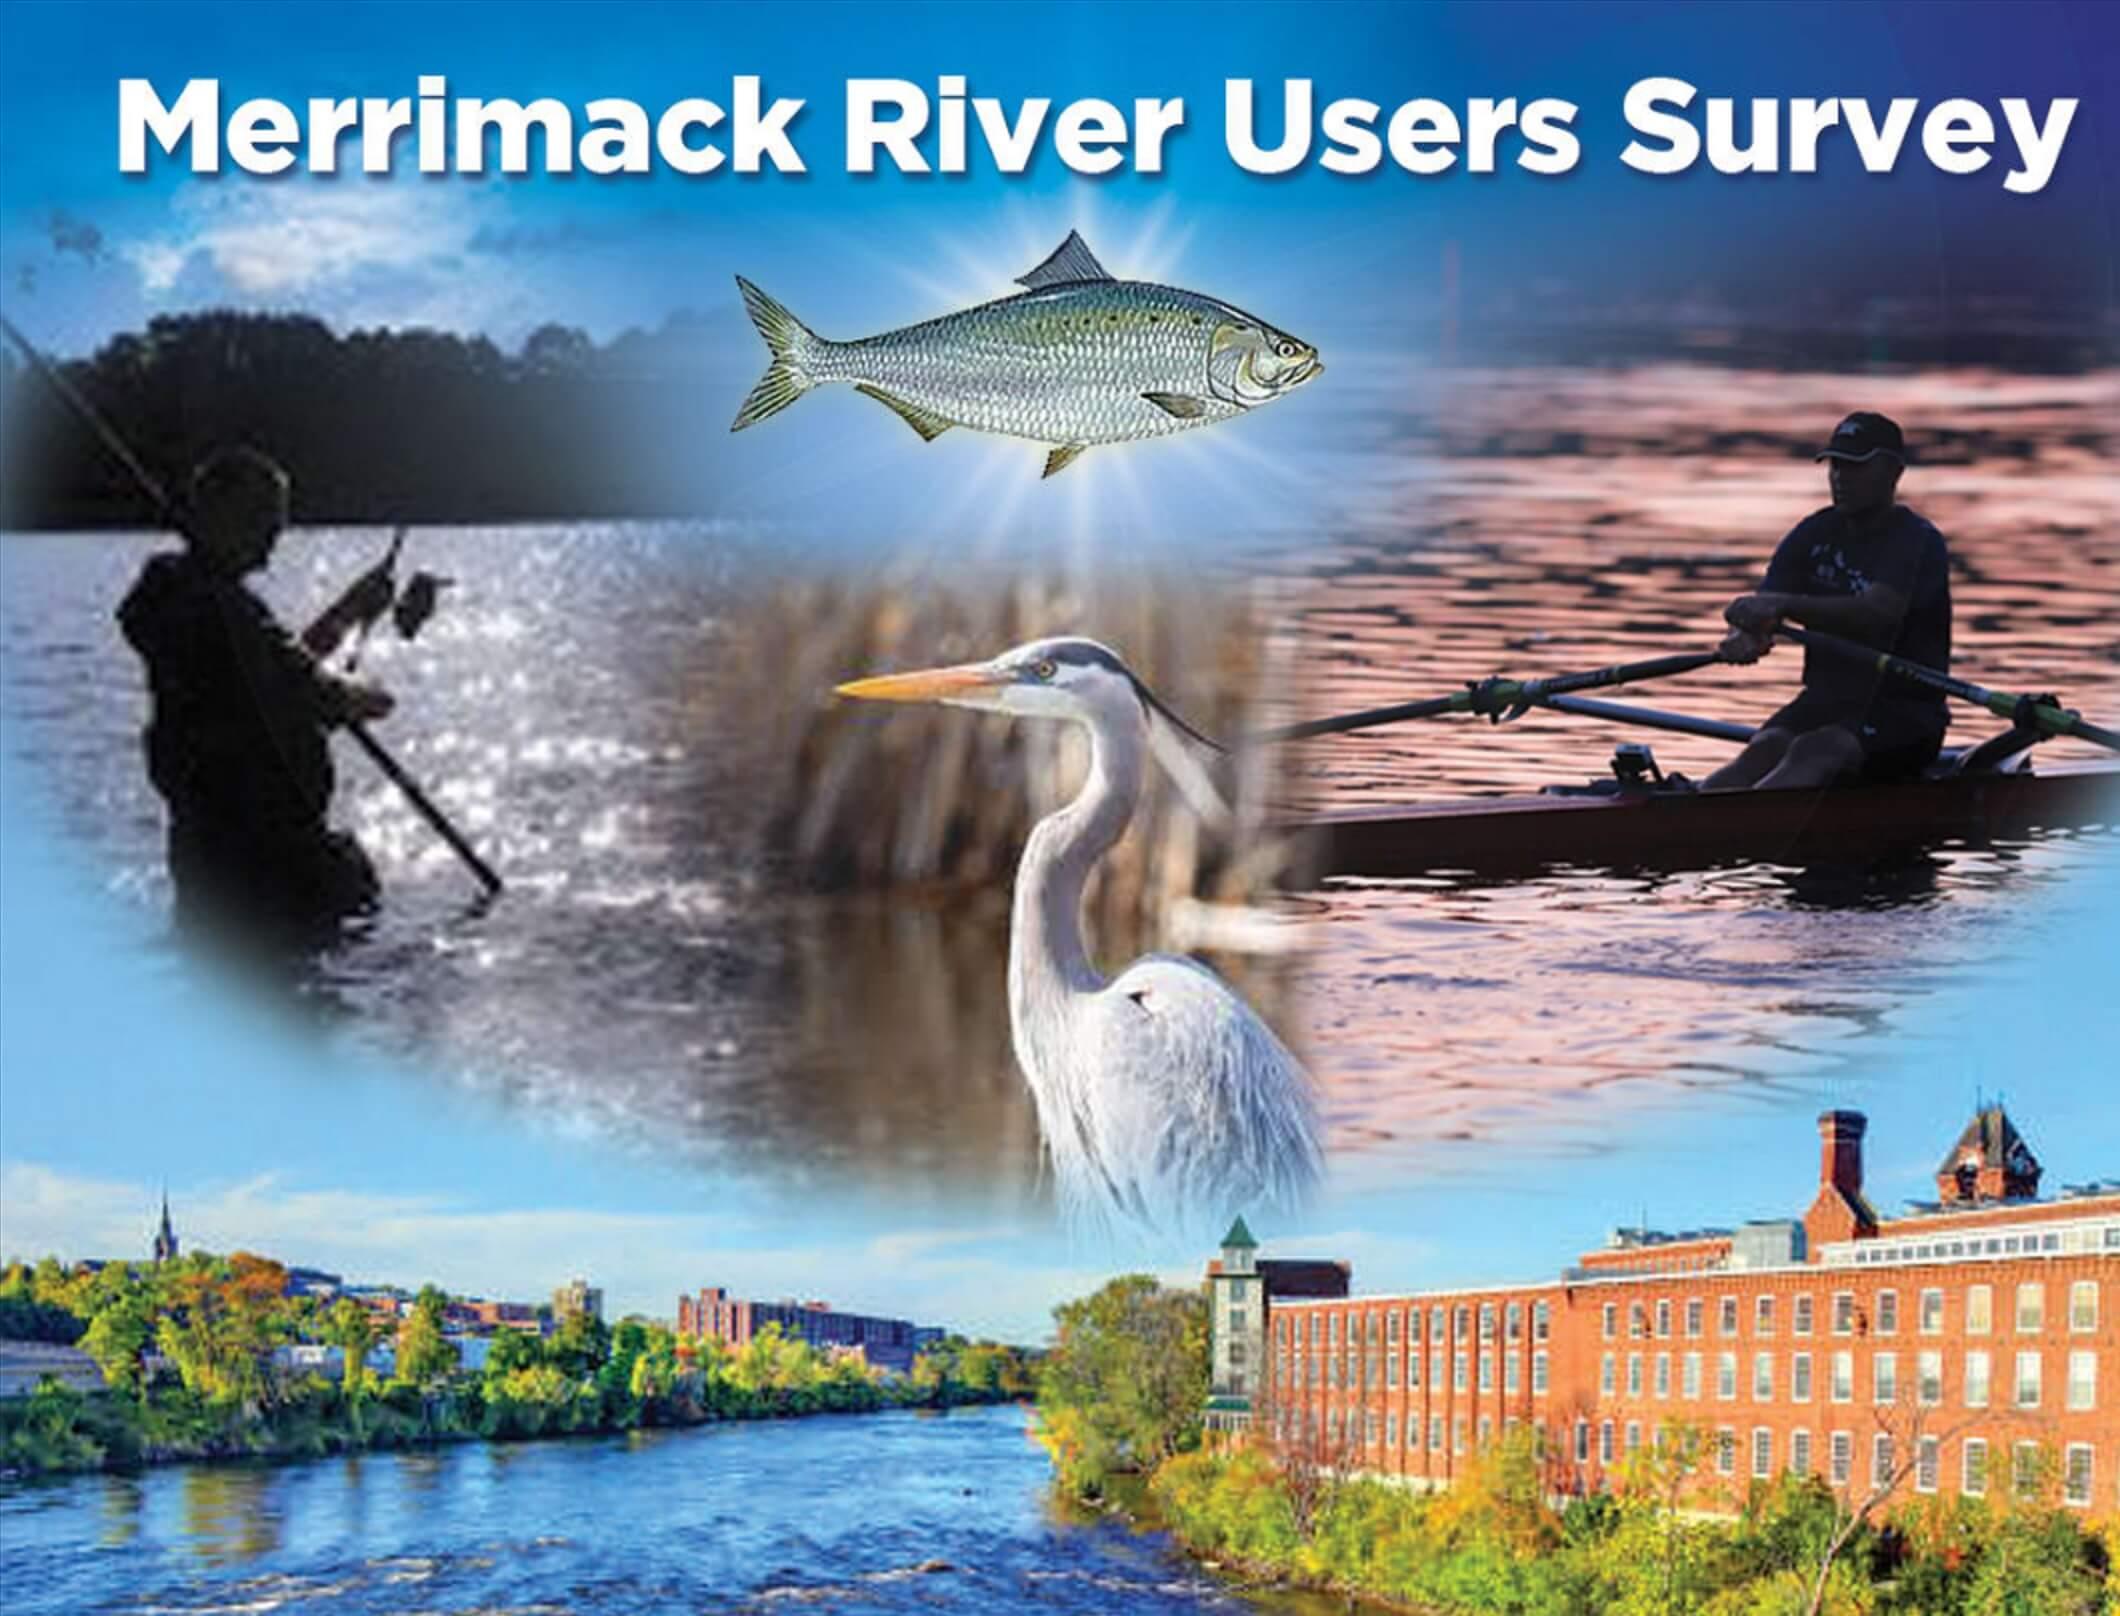 Merrimack River Users Survey